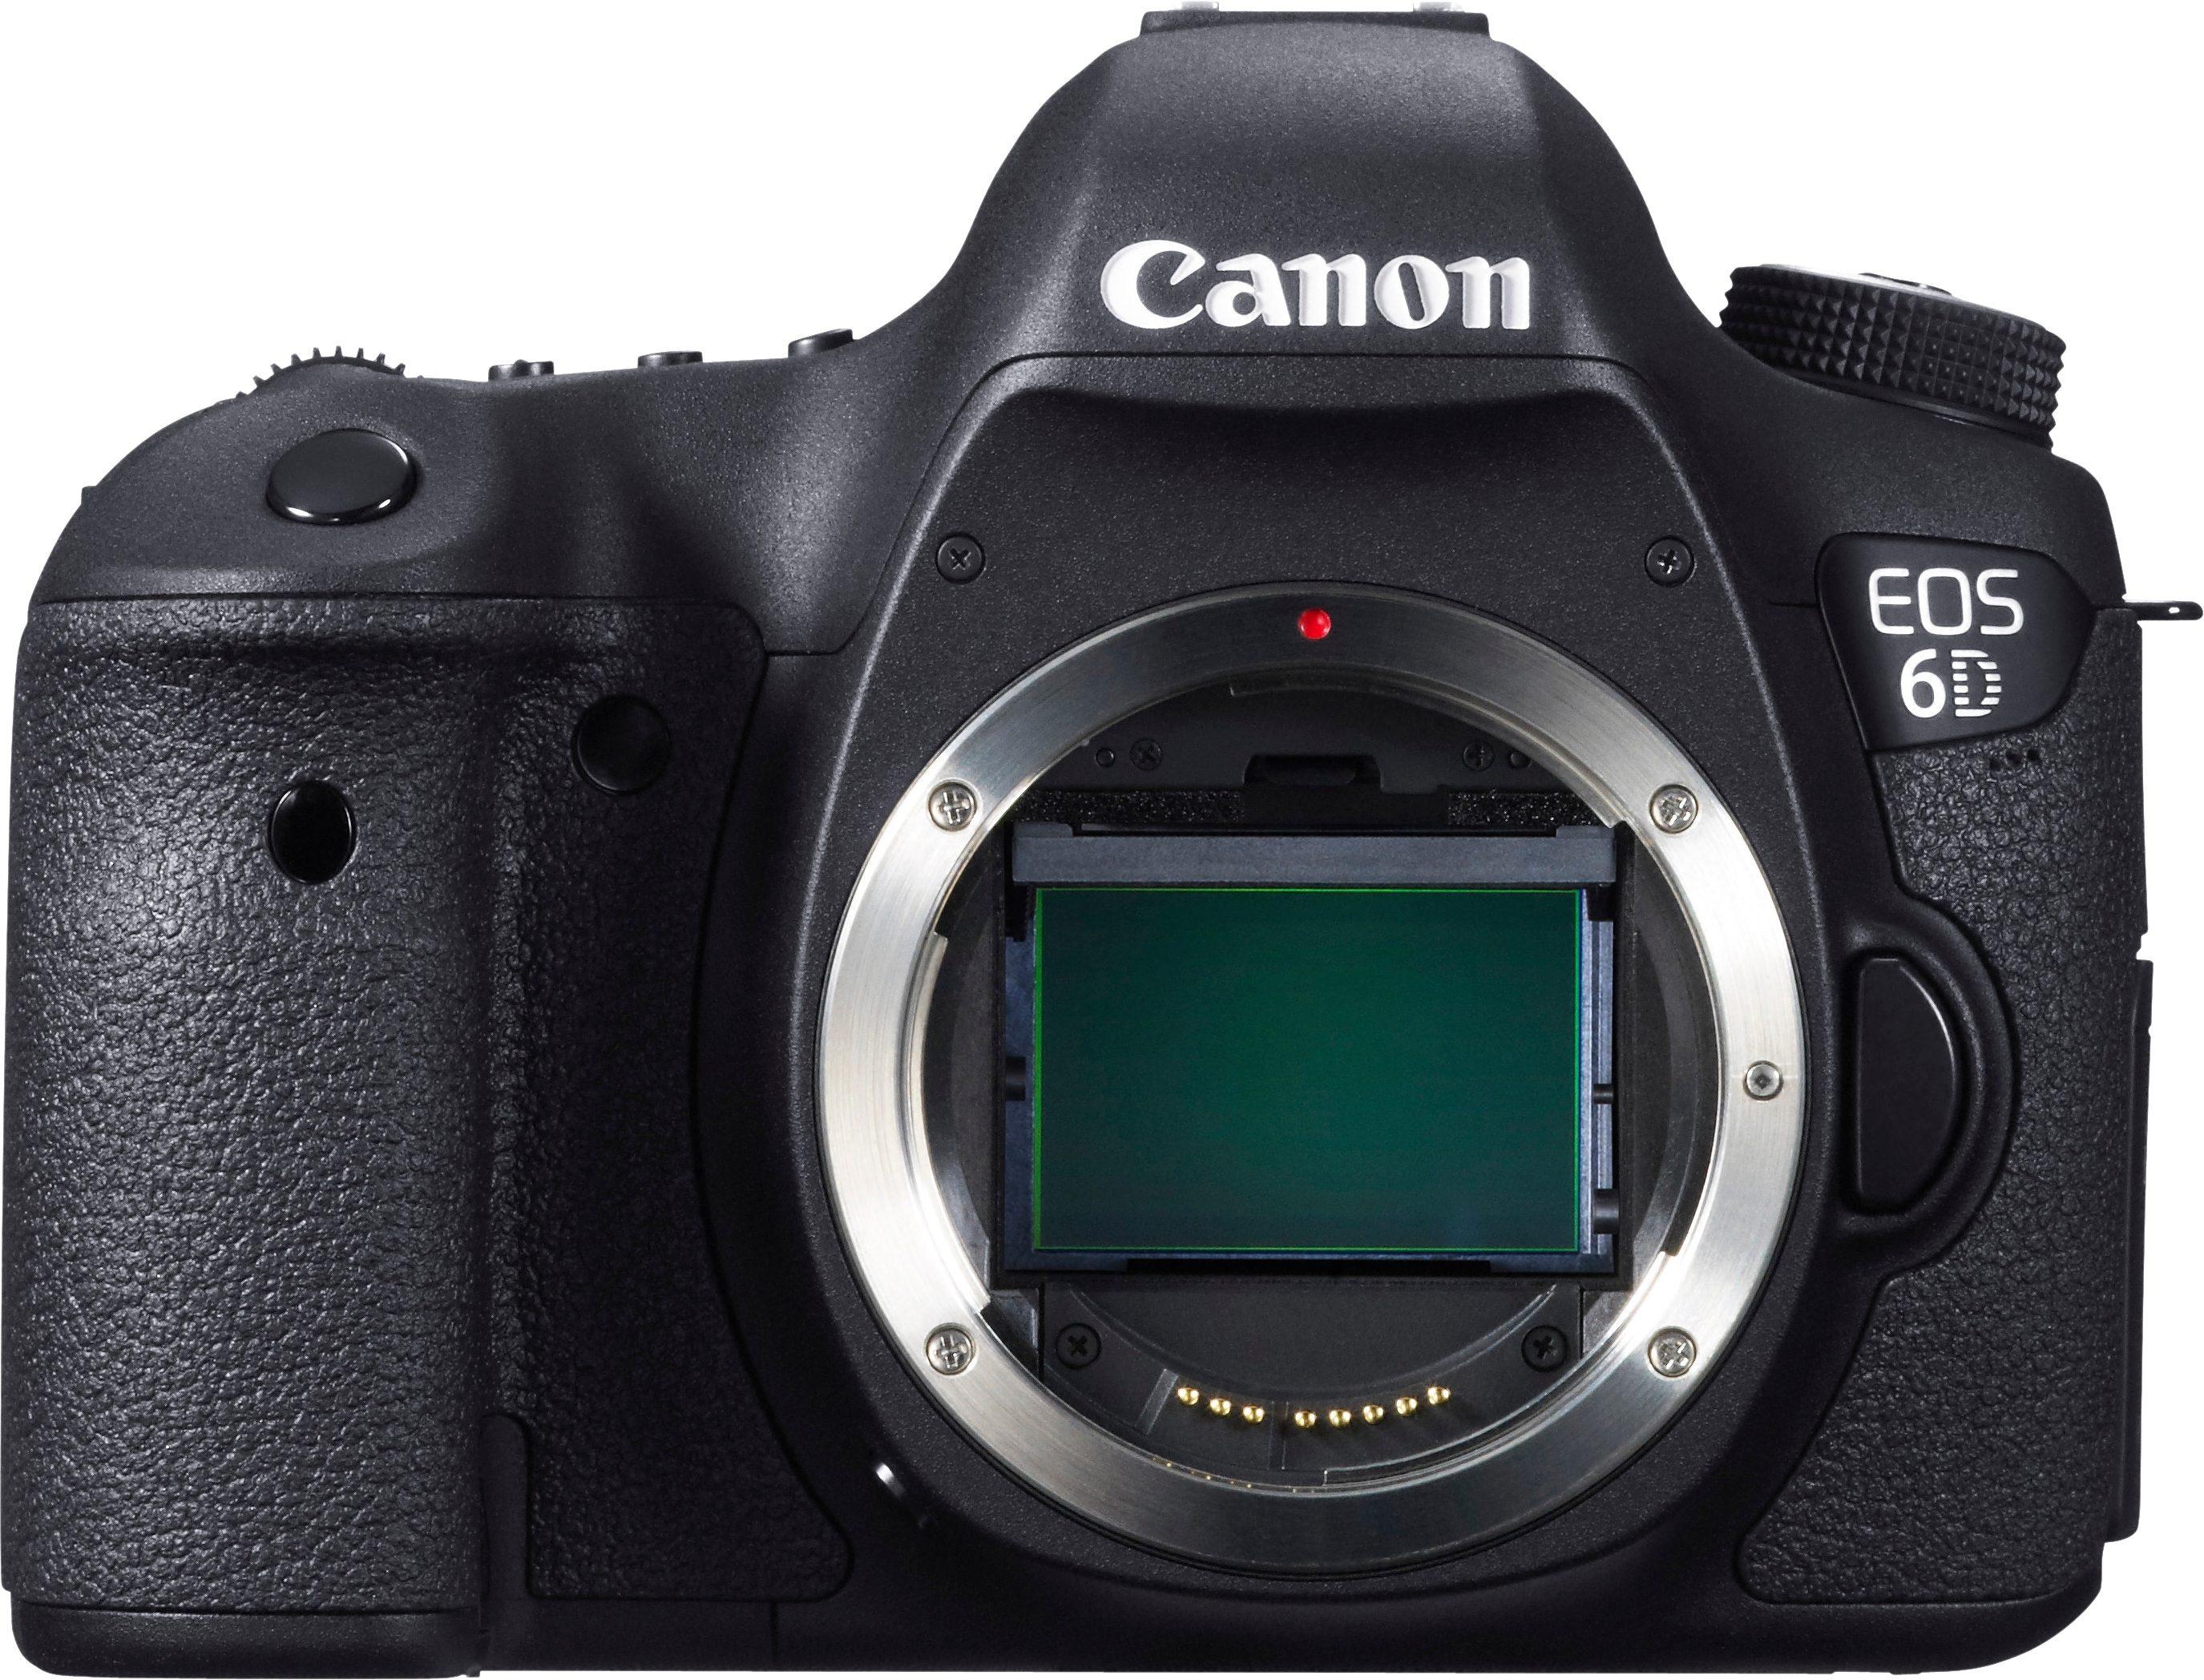 Canon EOS 6D Body Spiegelreflex Kamera, 20,2 Megapixel, 7,7 cm (3 Zoll) Display